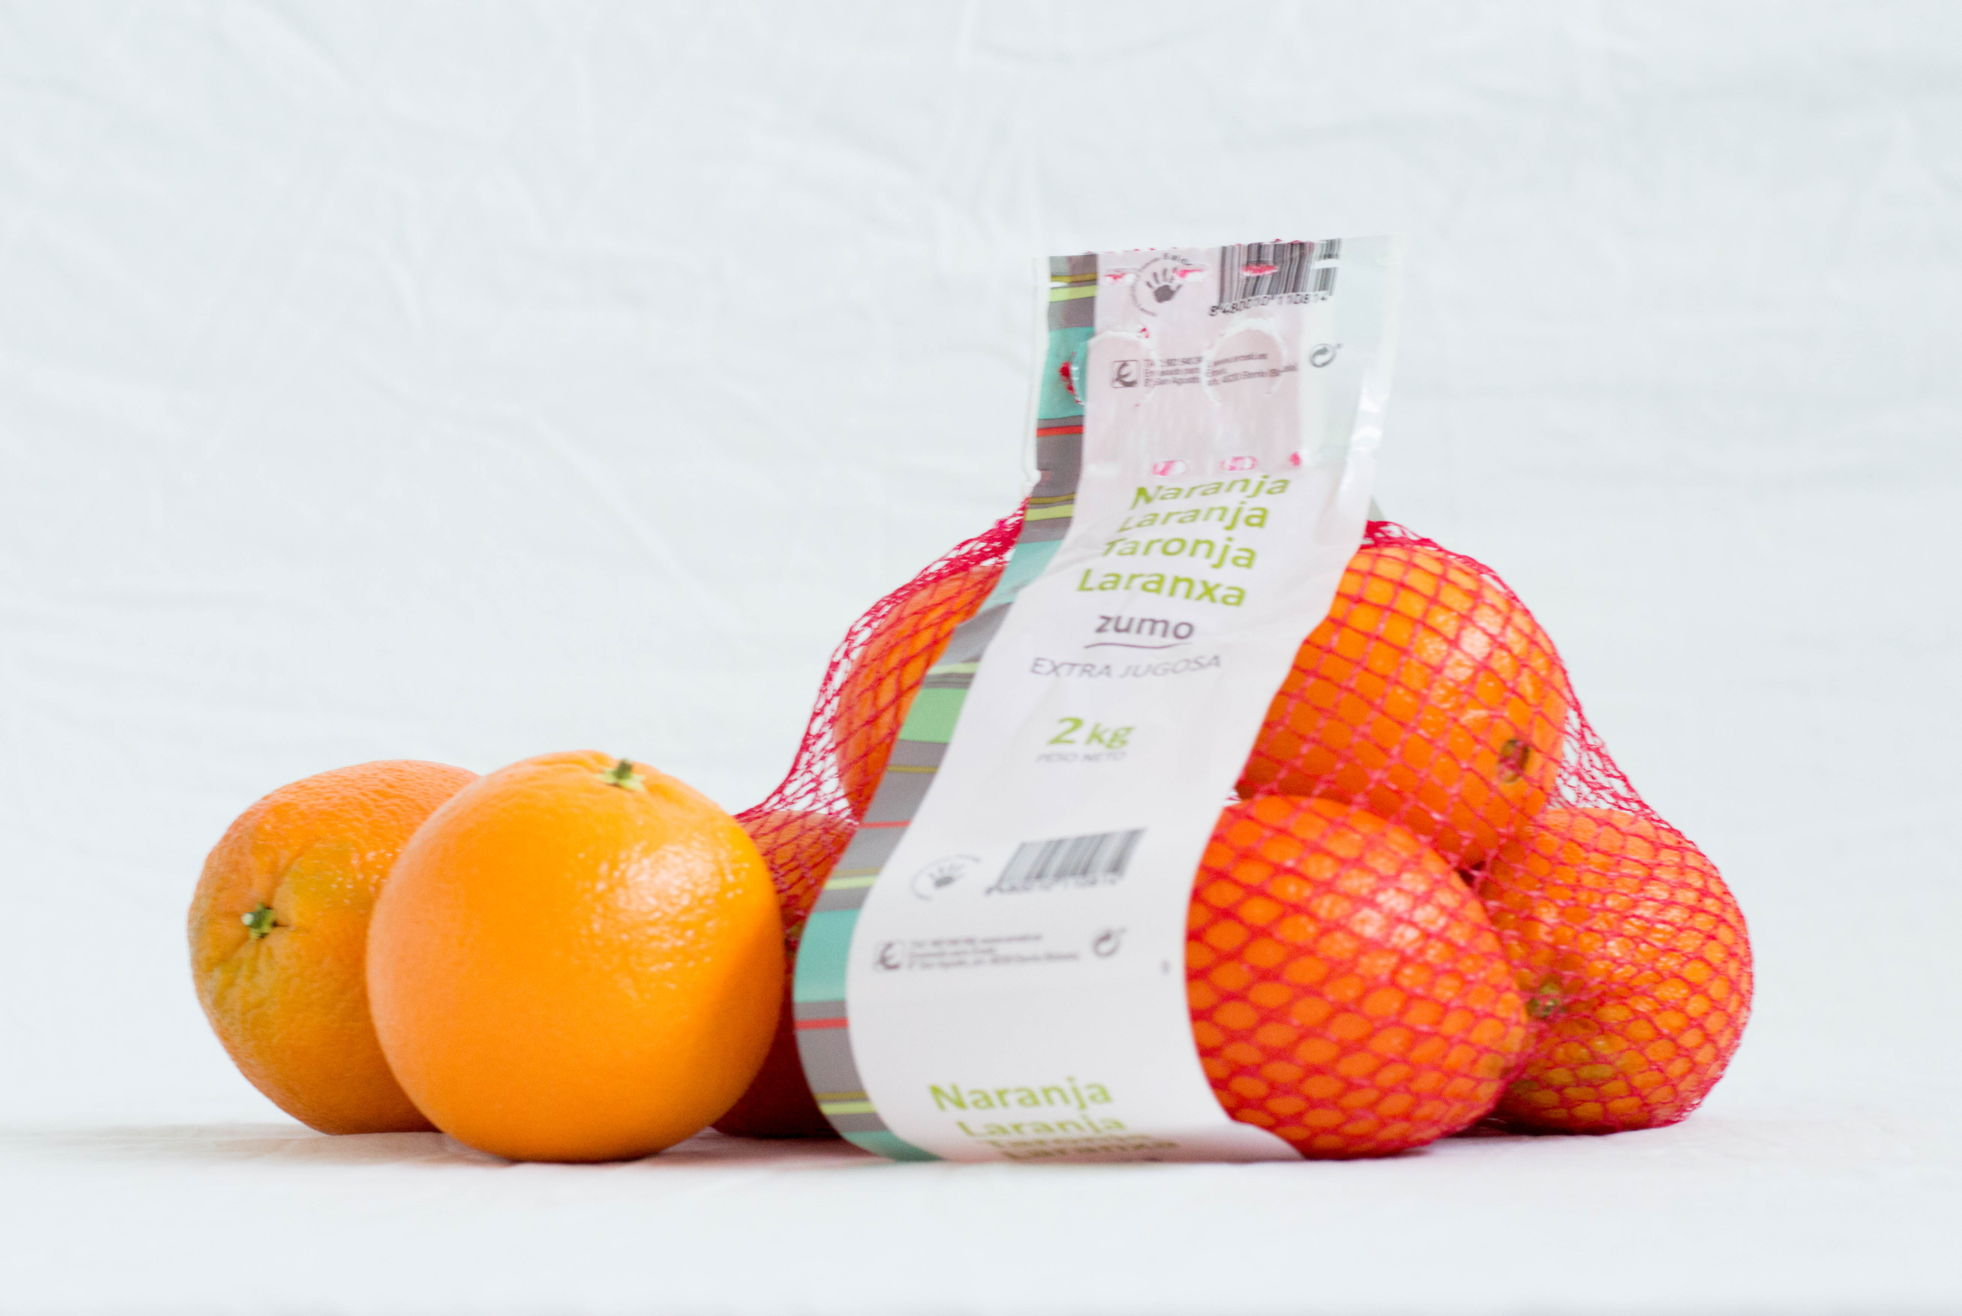 malla-naranja-germansfuster